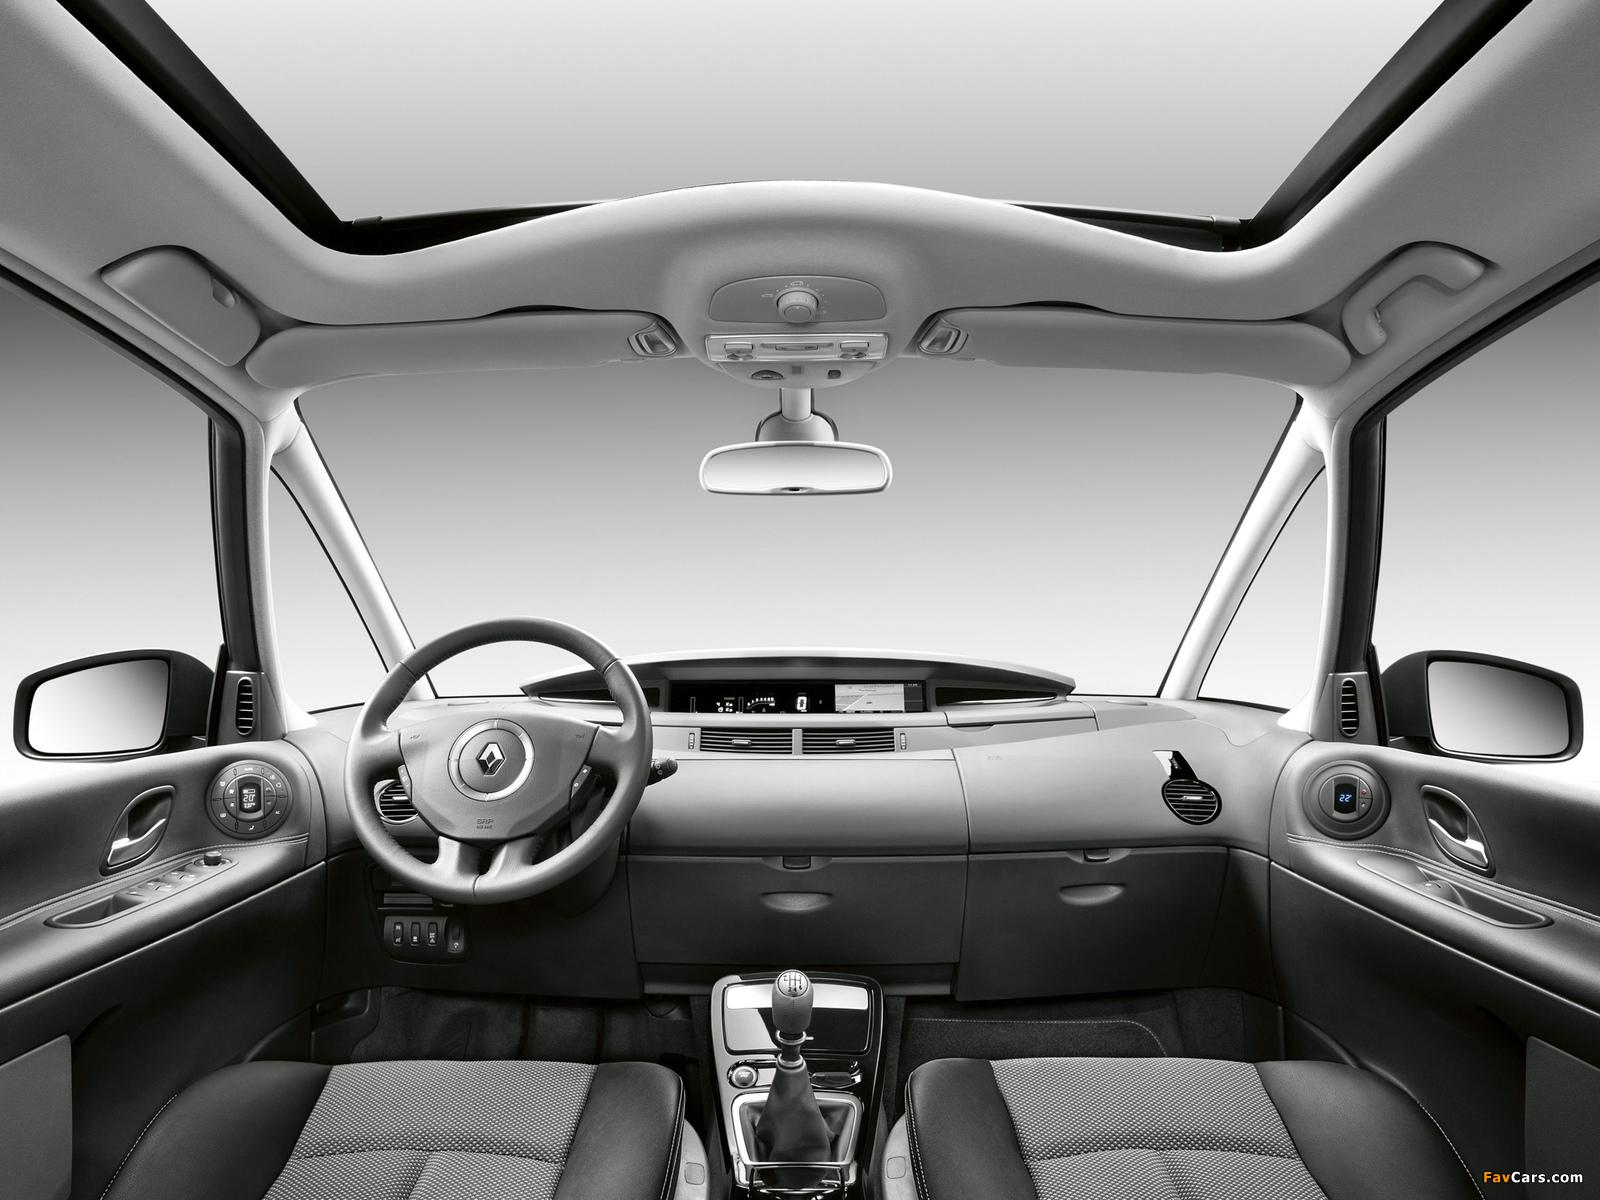 Renault Espace (J81) 2006 pictures (1600 x 1200)